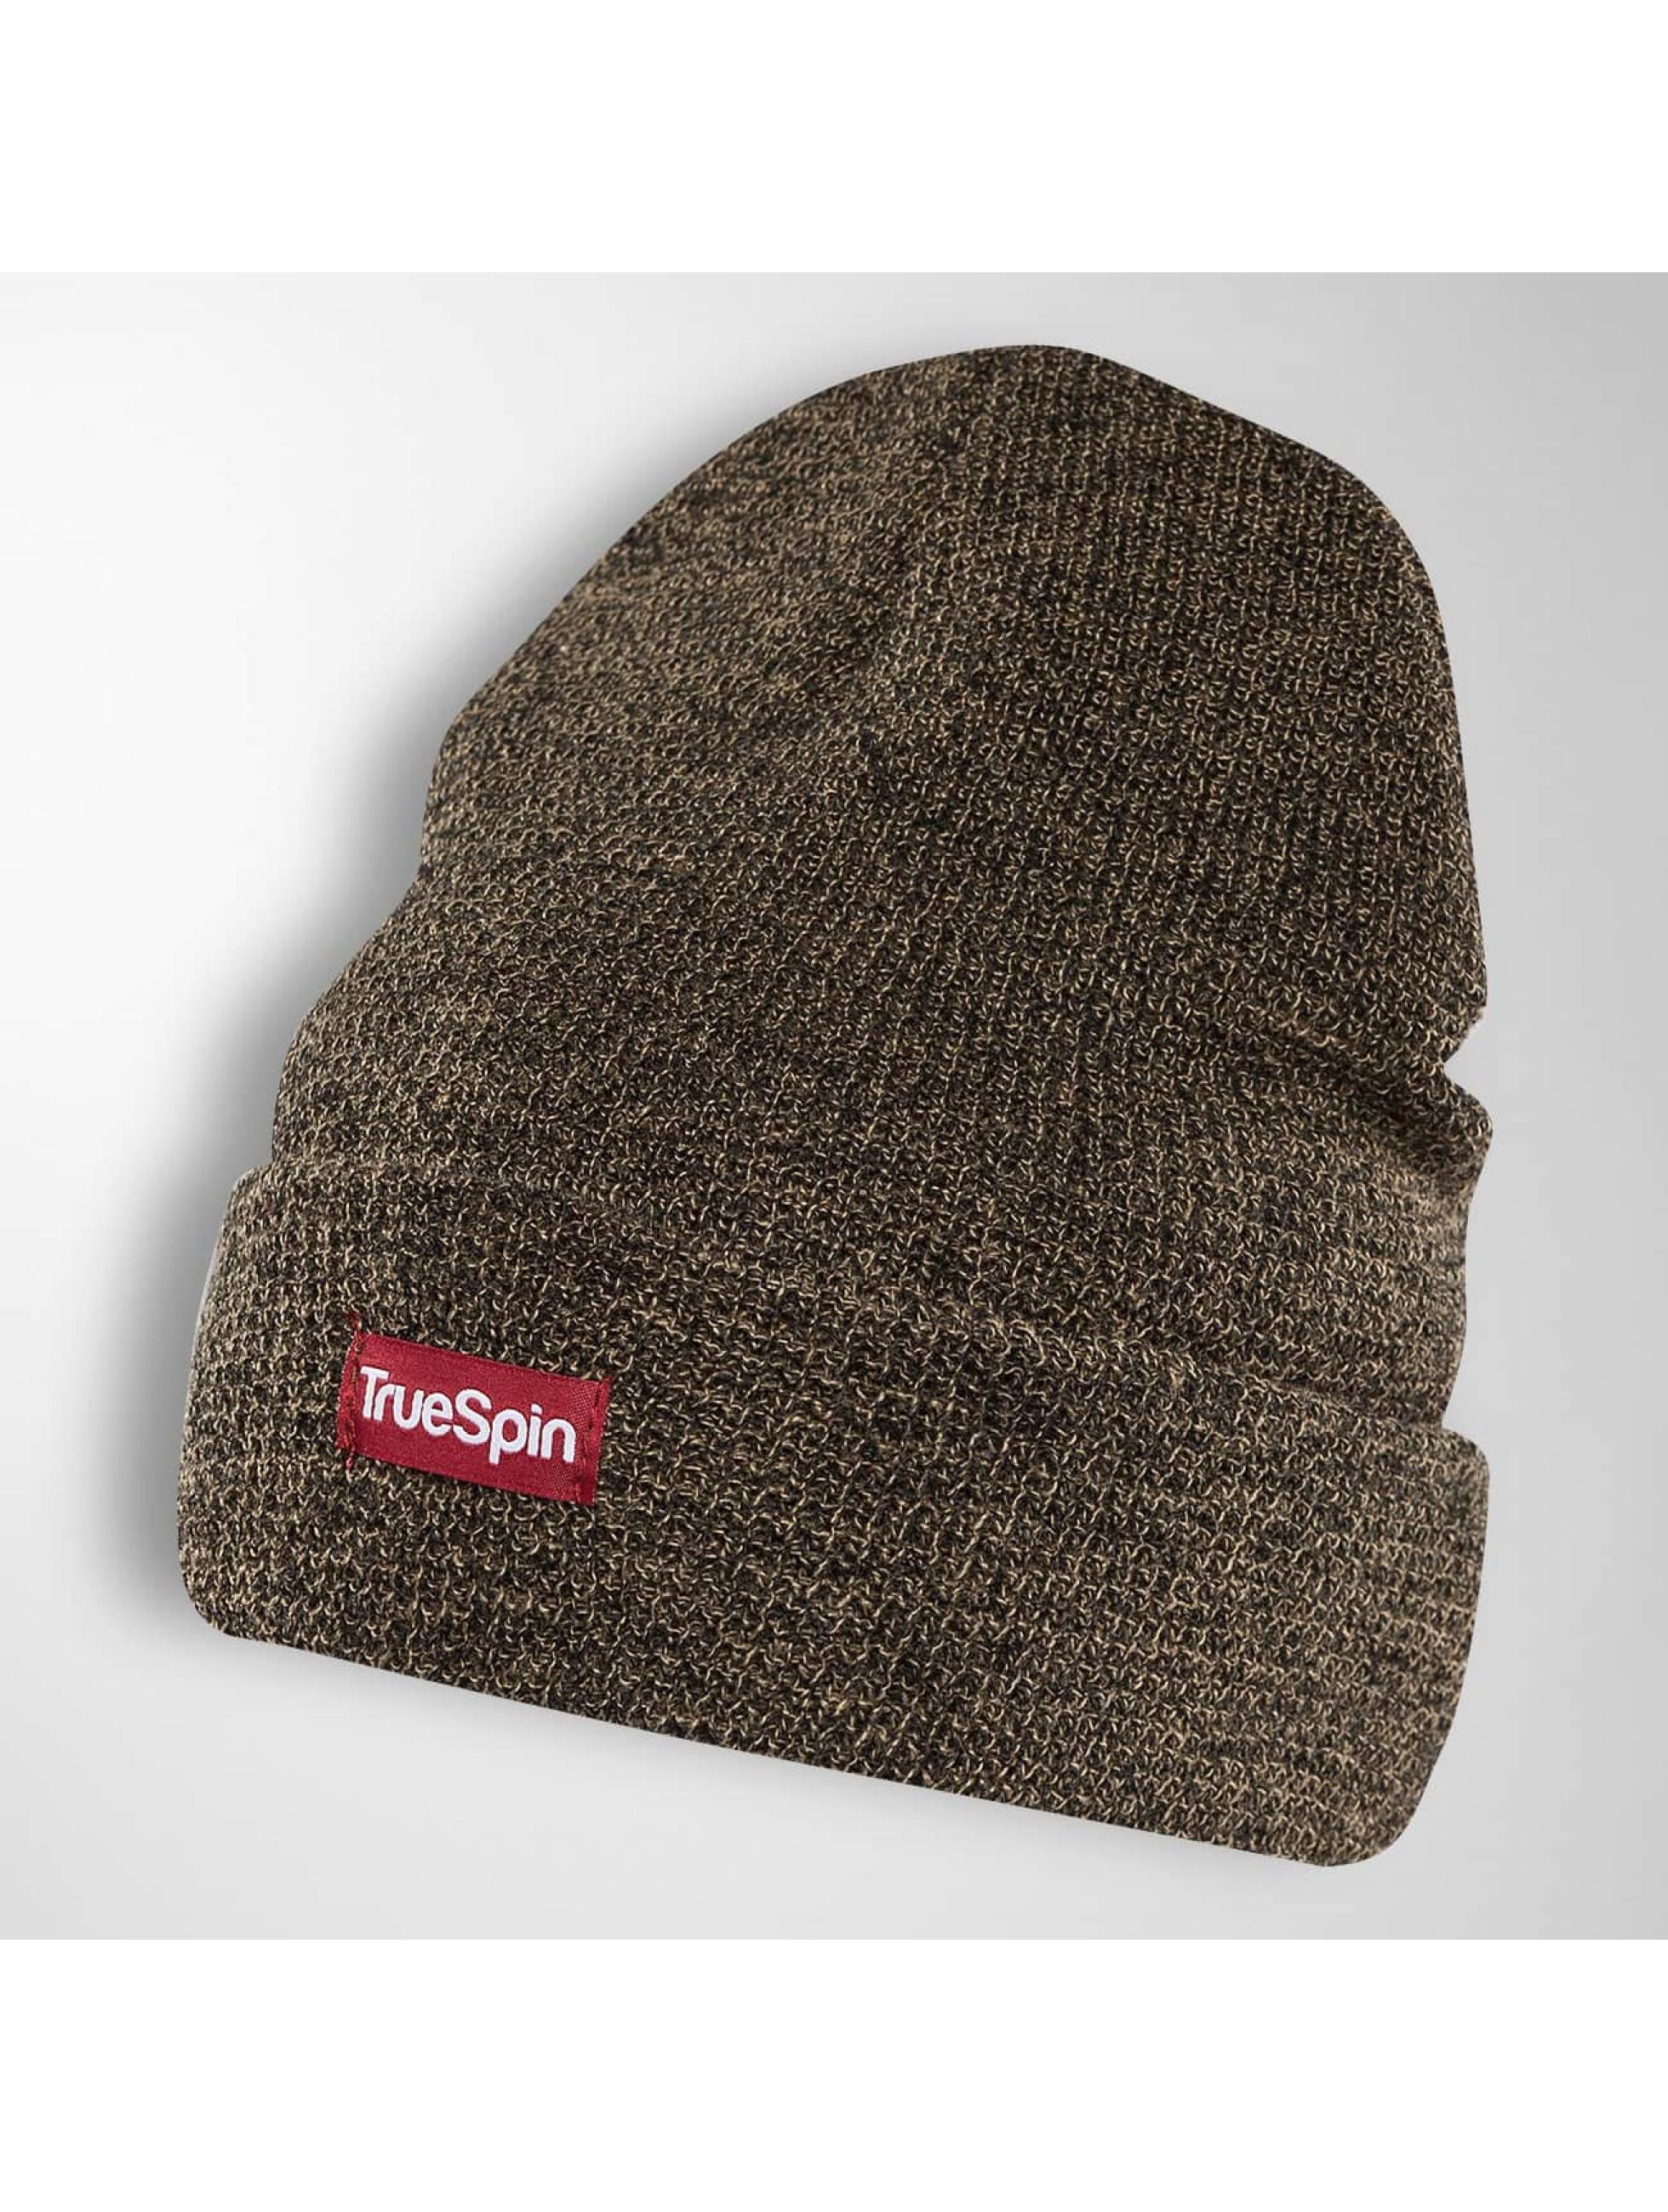 TrueSpin шляпа Ice коричневый